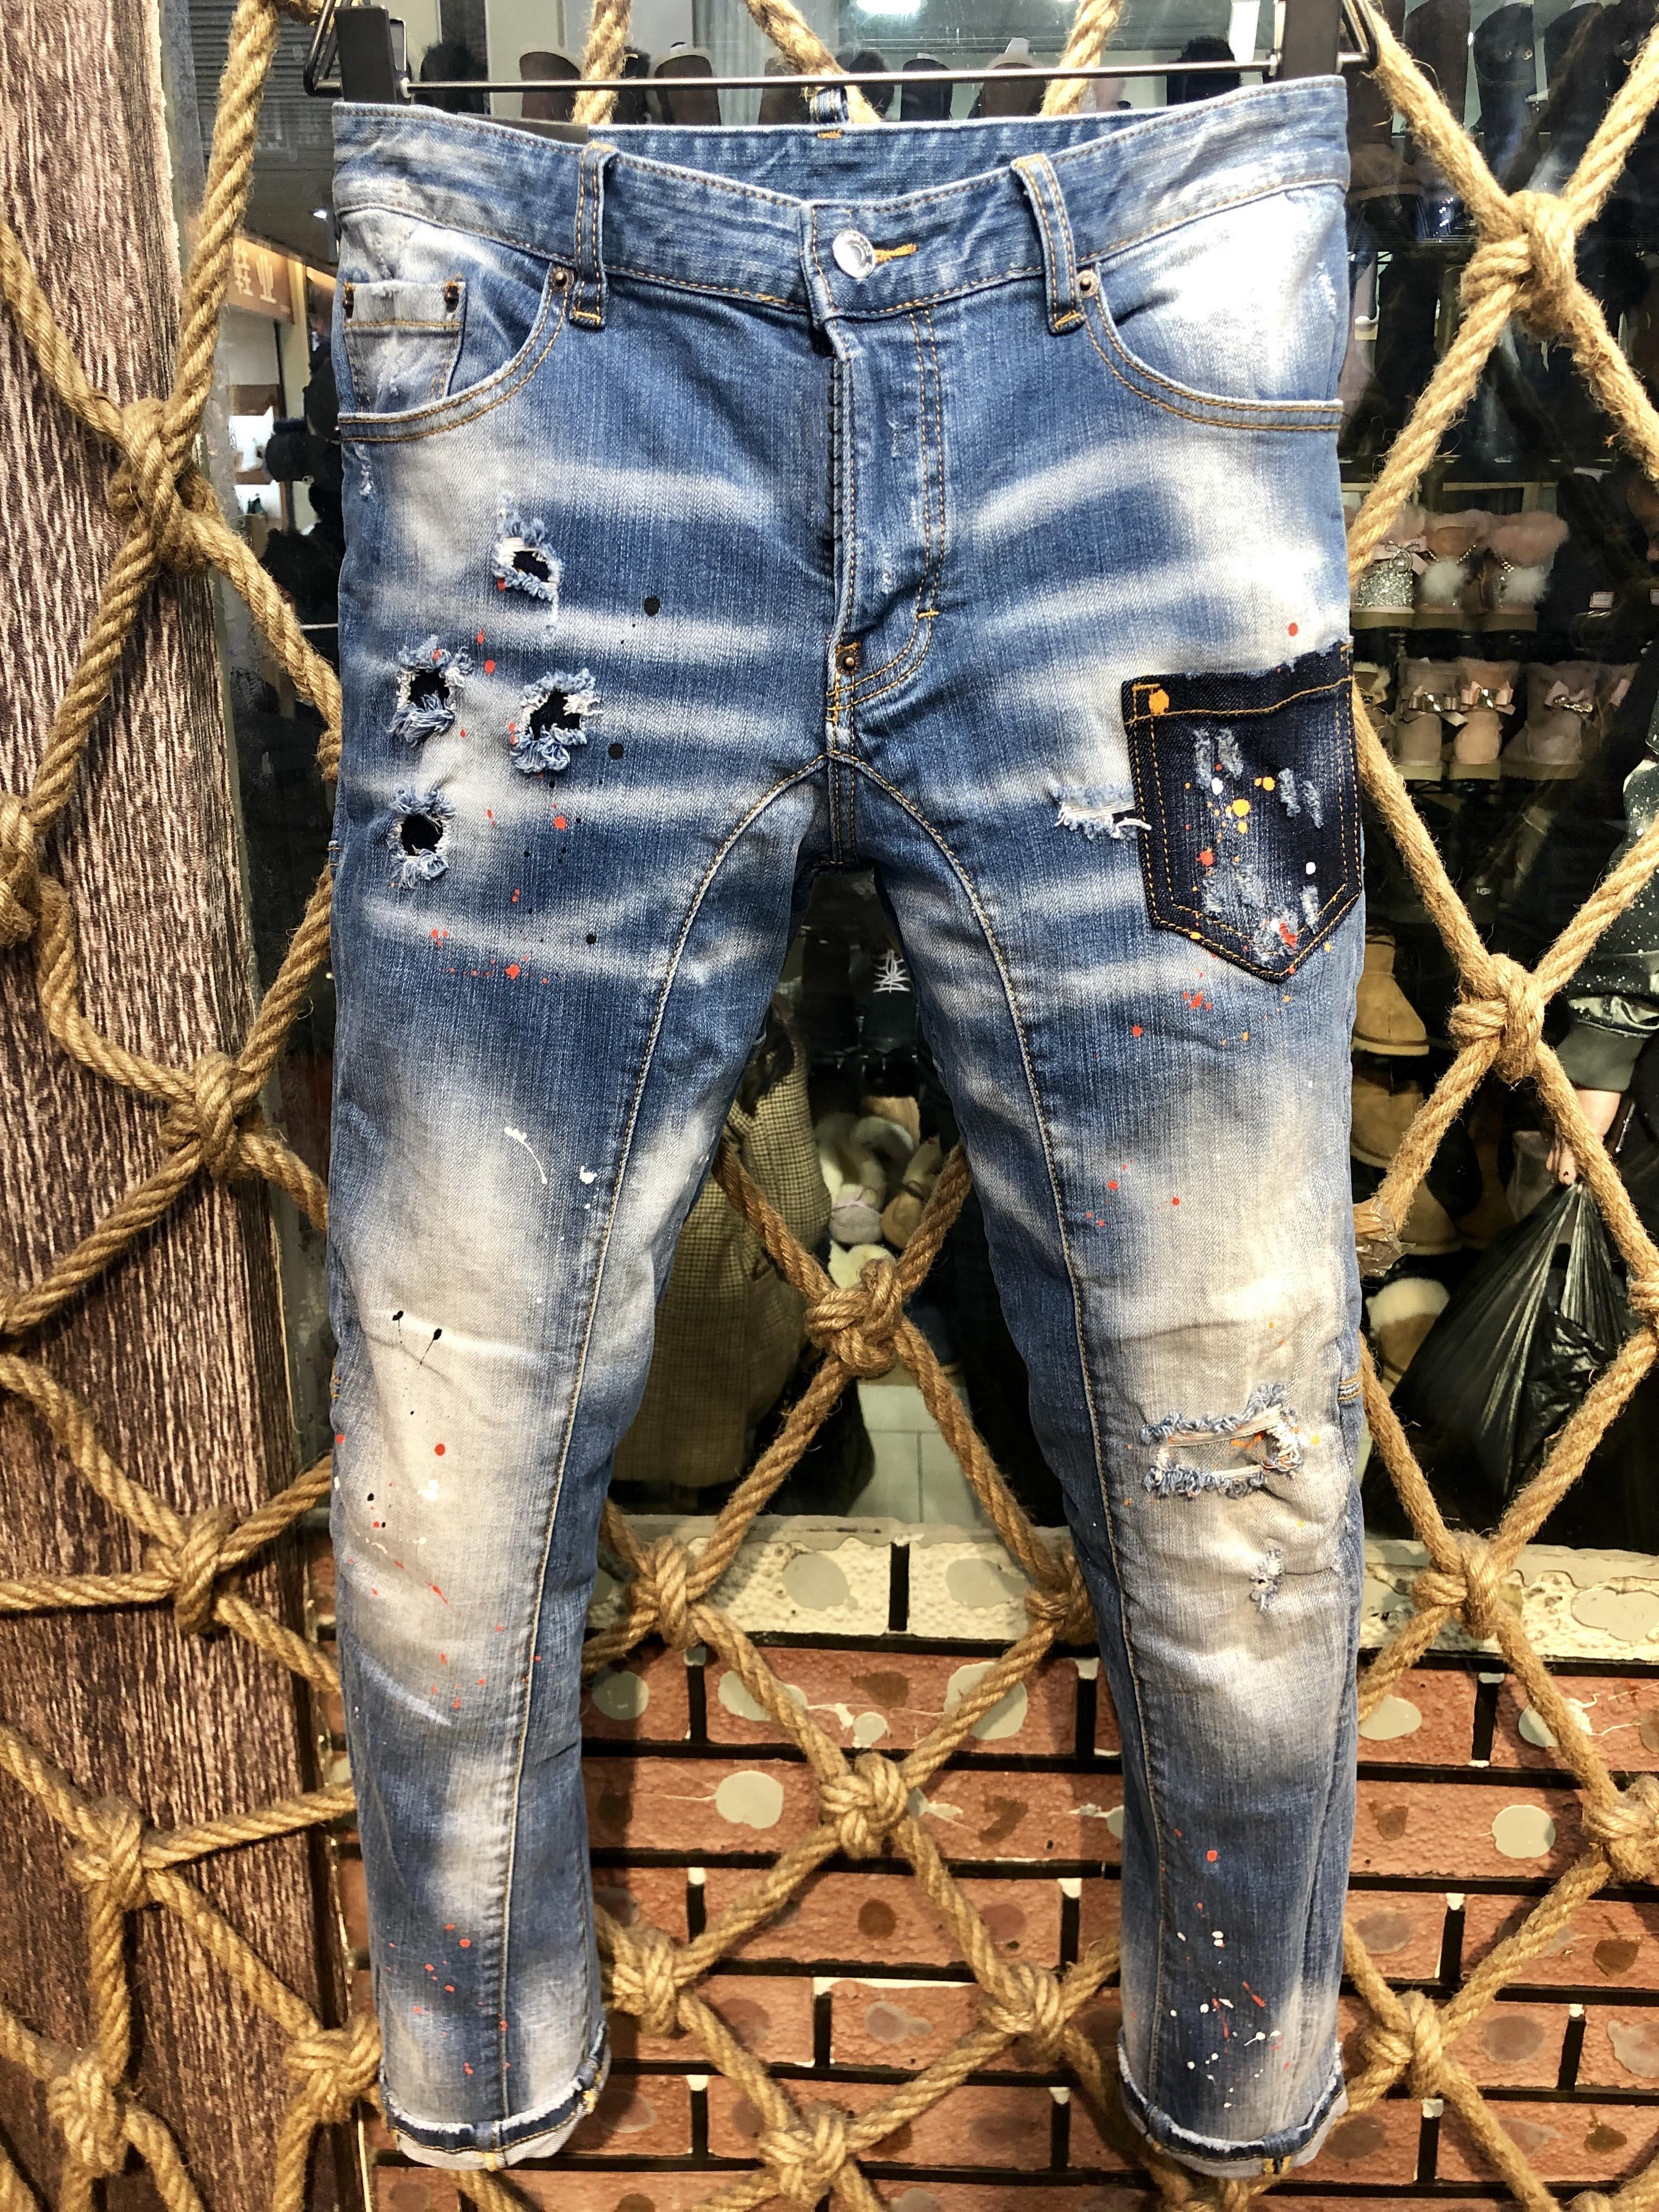 21s Mens jeans designer Ripped Skinny Trousers Moto biker hole Slim Fashion Brand Distressed ture Denim pants Hip hop Men D2 A226 dsquared2 dsquared 2 dsq